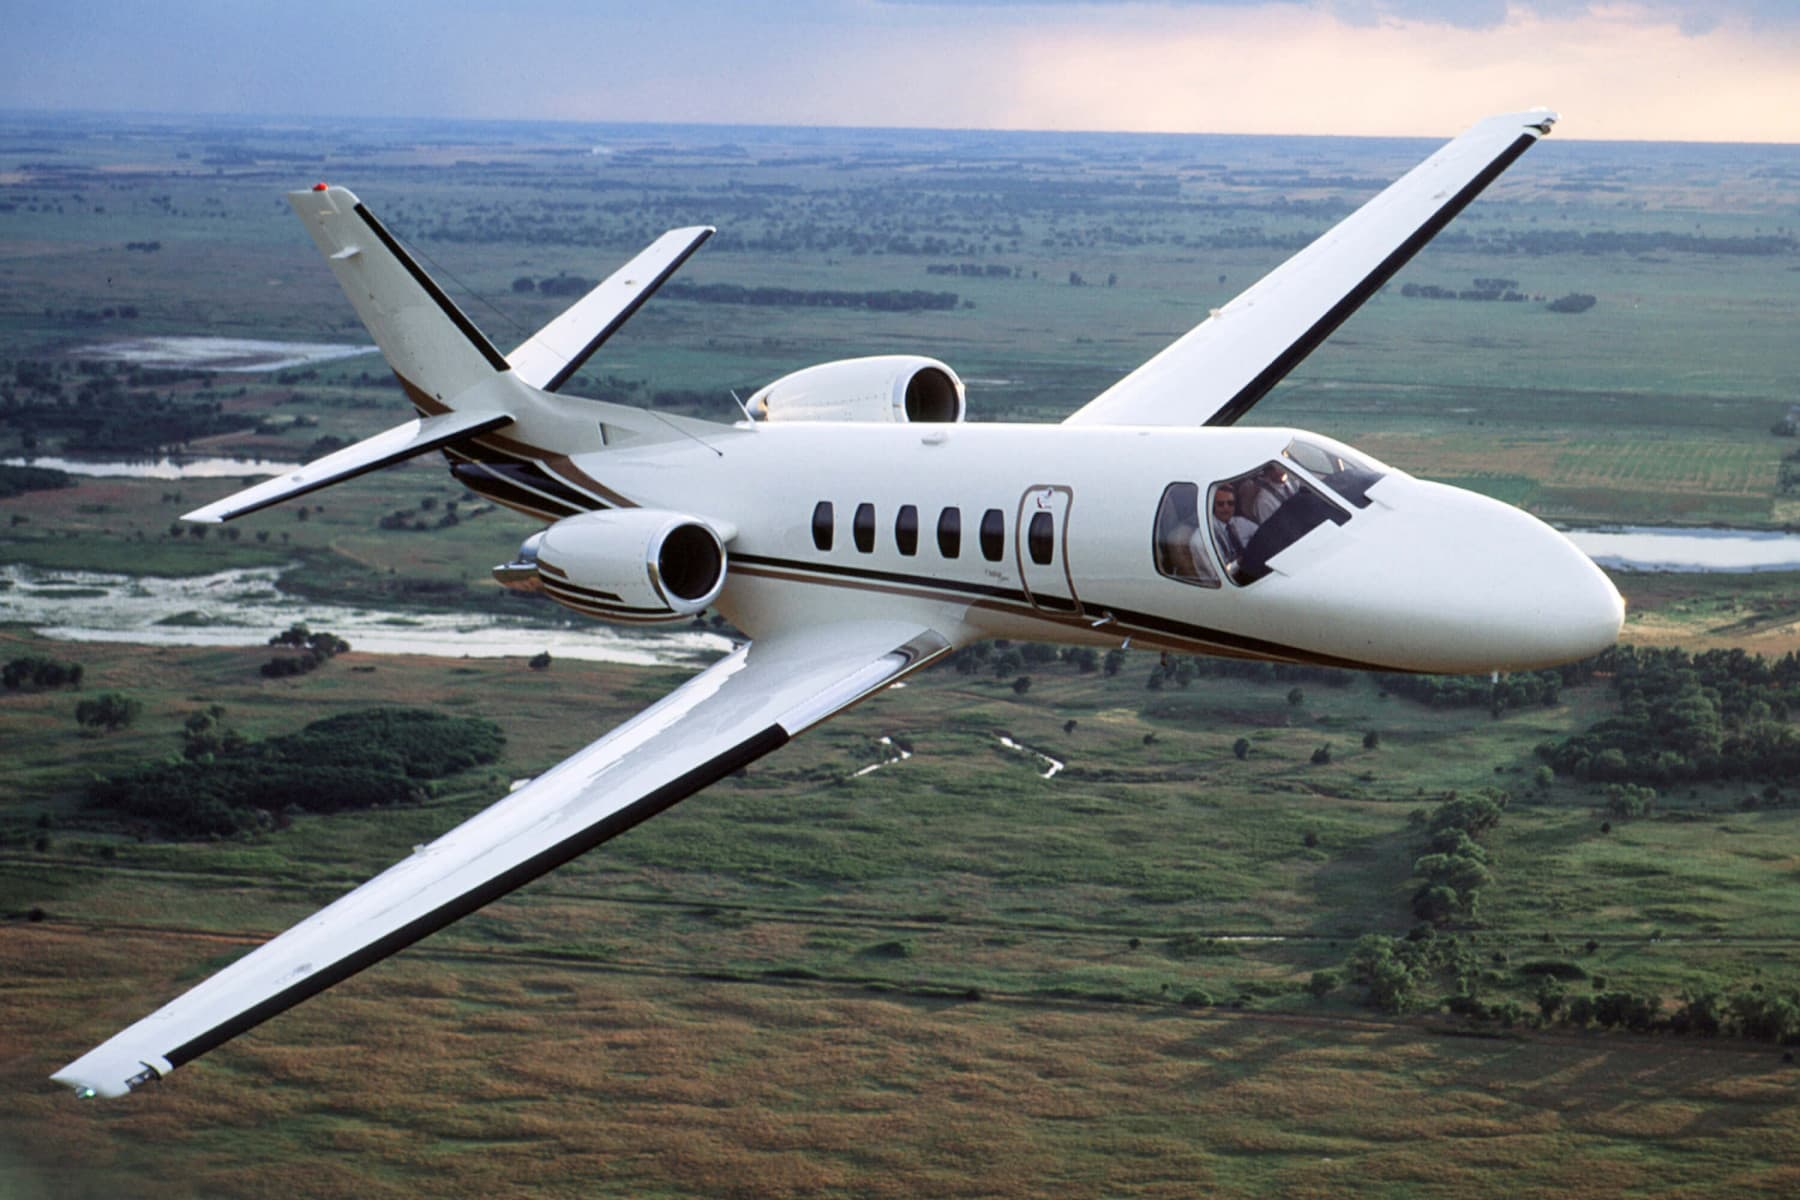 Cessna Citation II/550